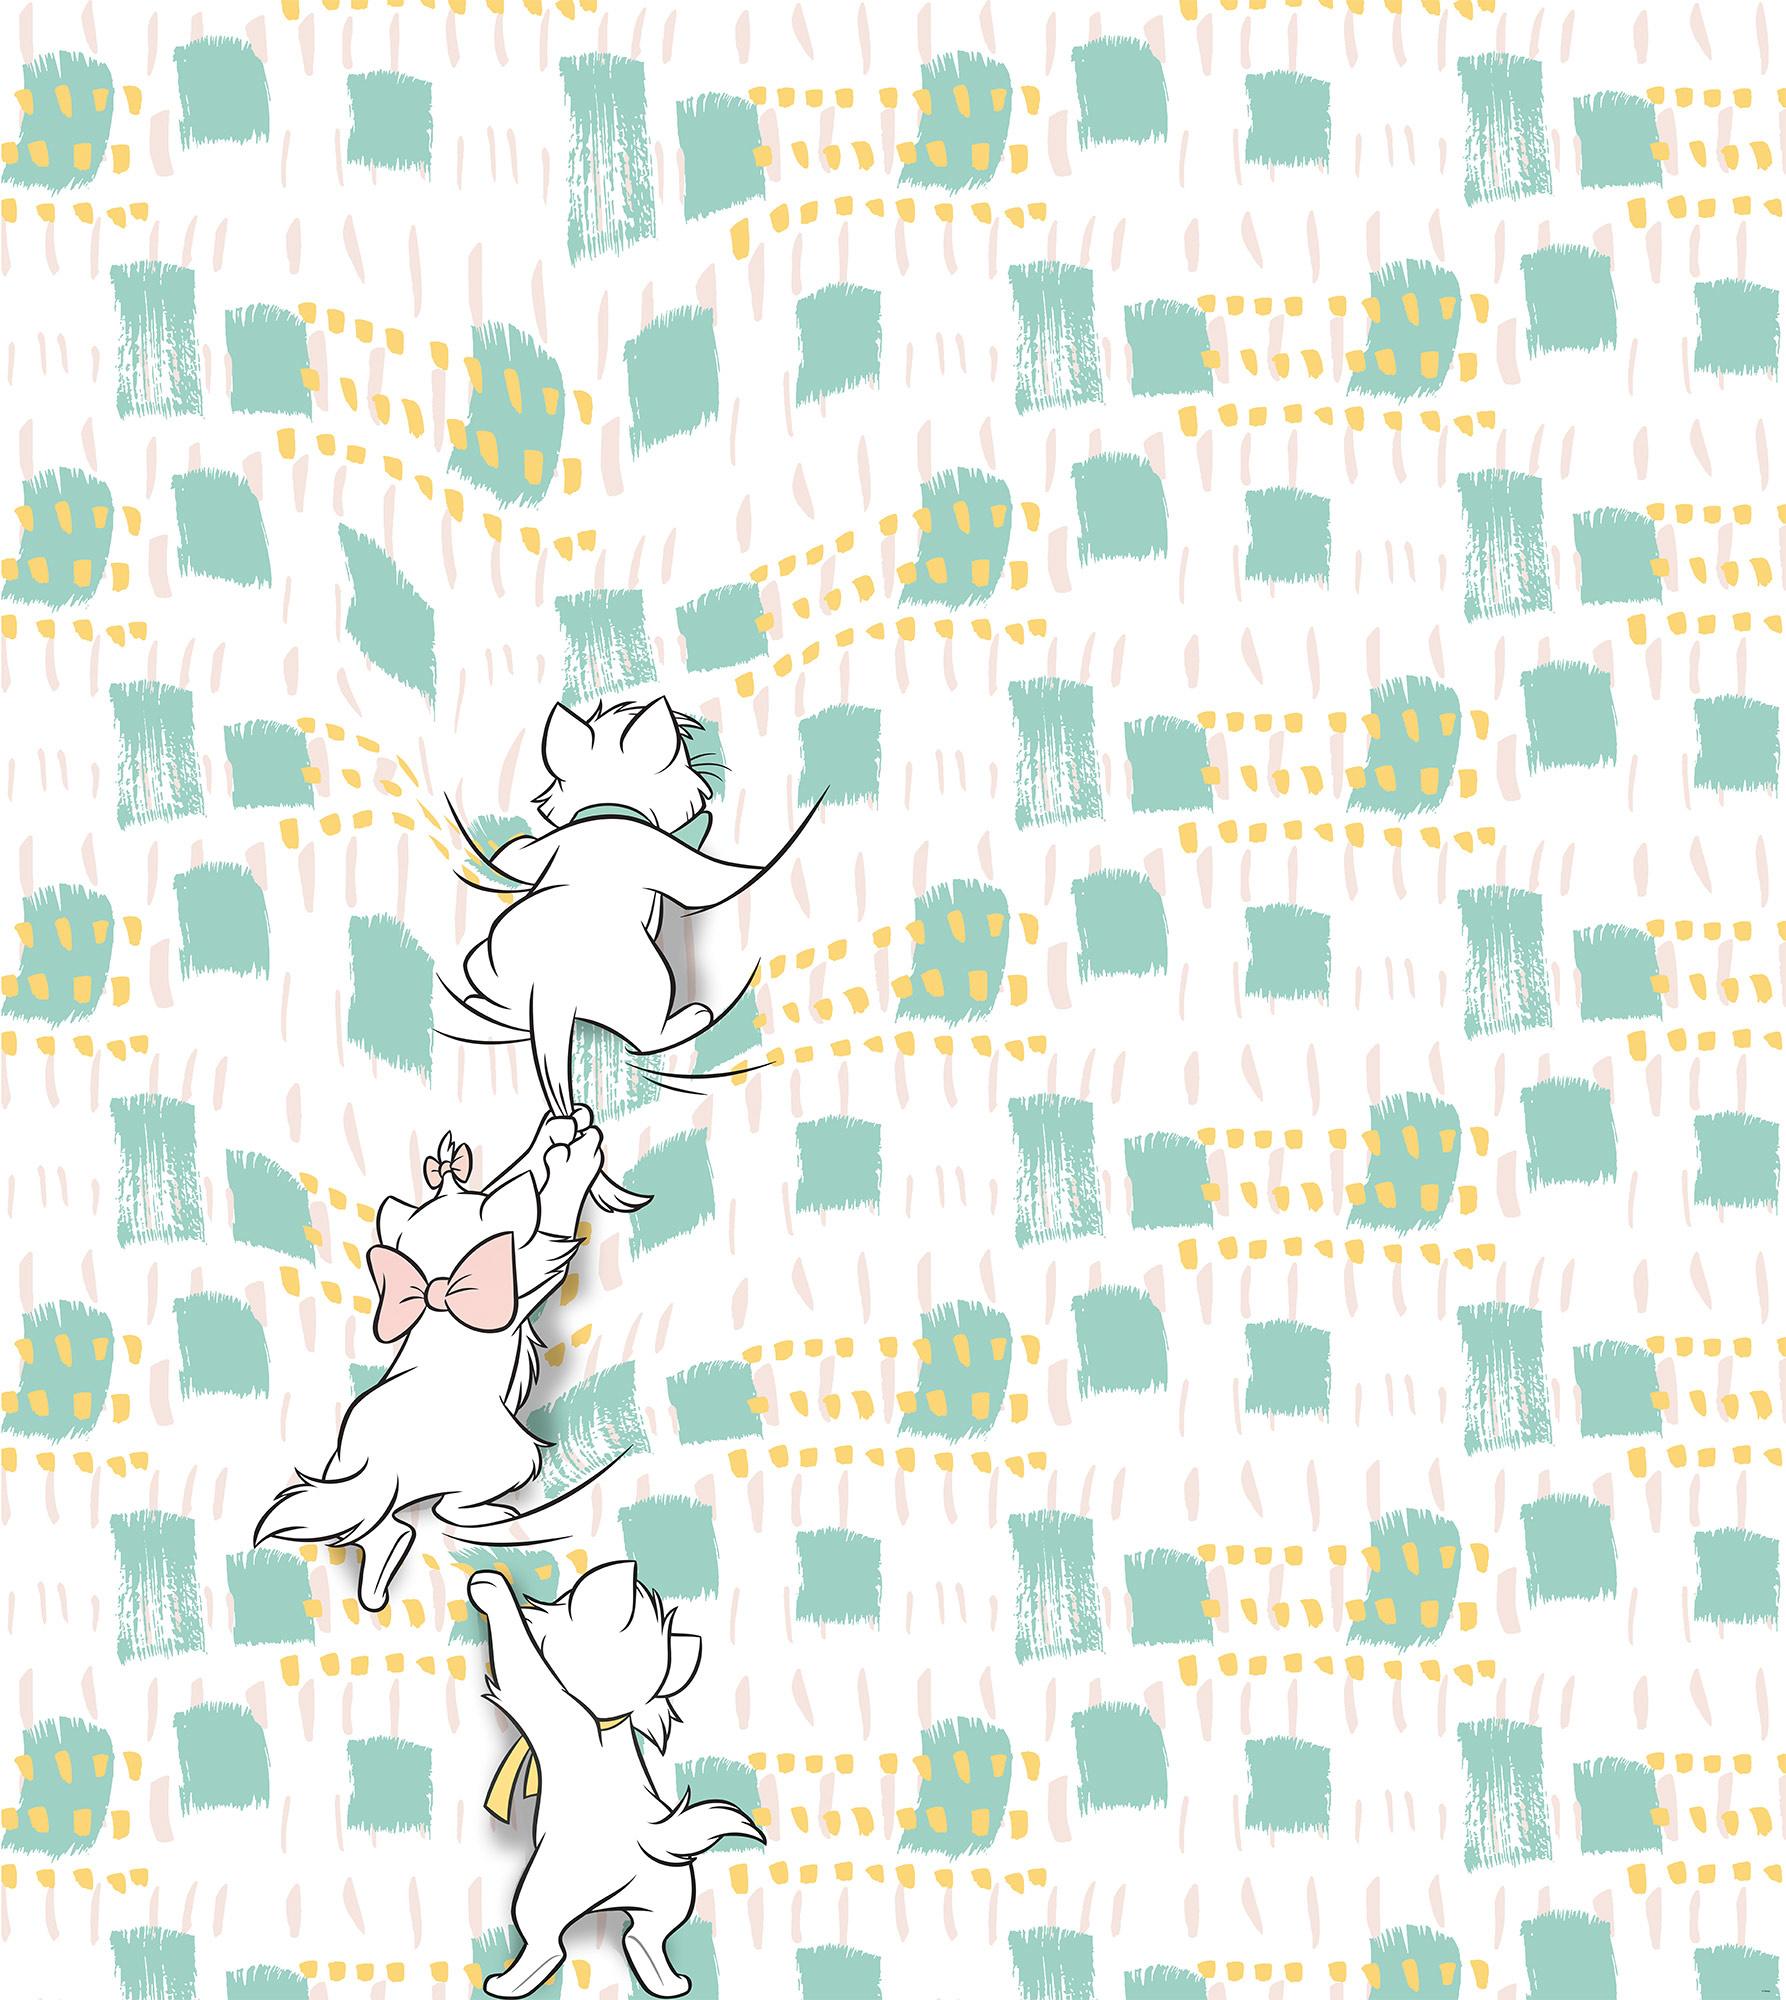 Disney Edition 4 Kinderbehang Komar - Kinderkamer behang Kitty Climbers